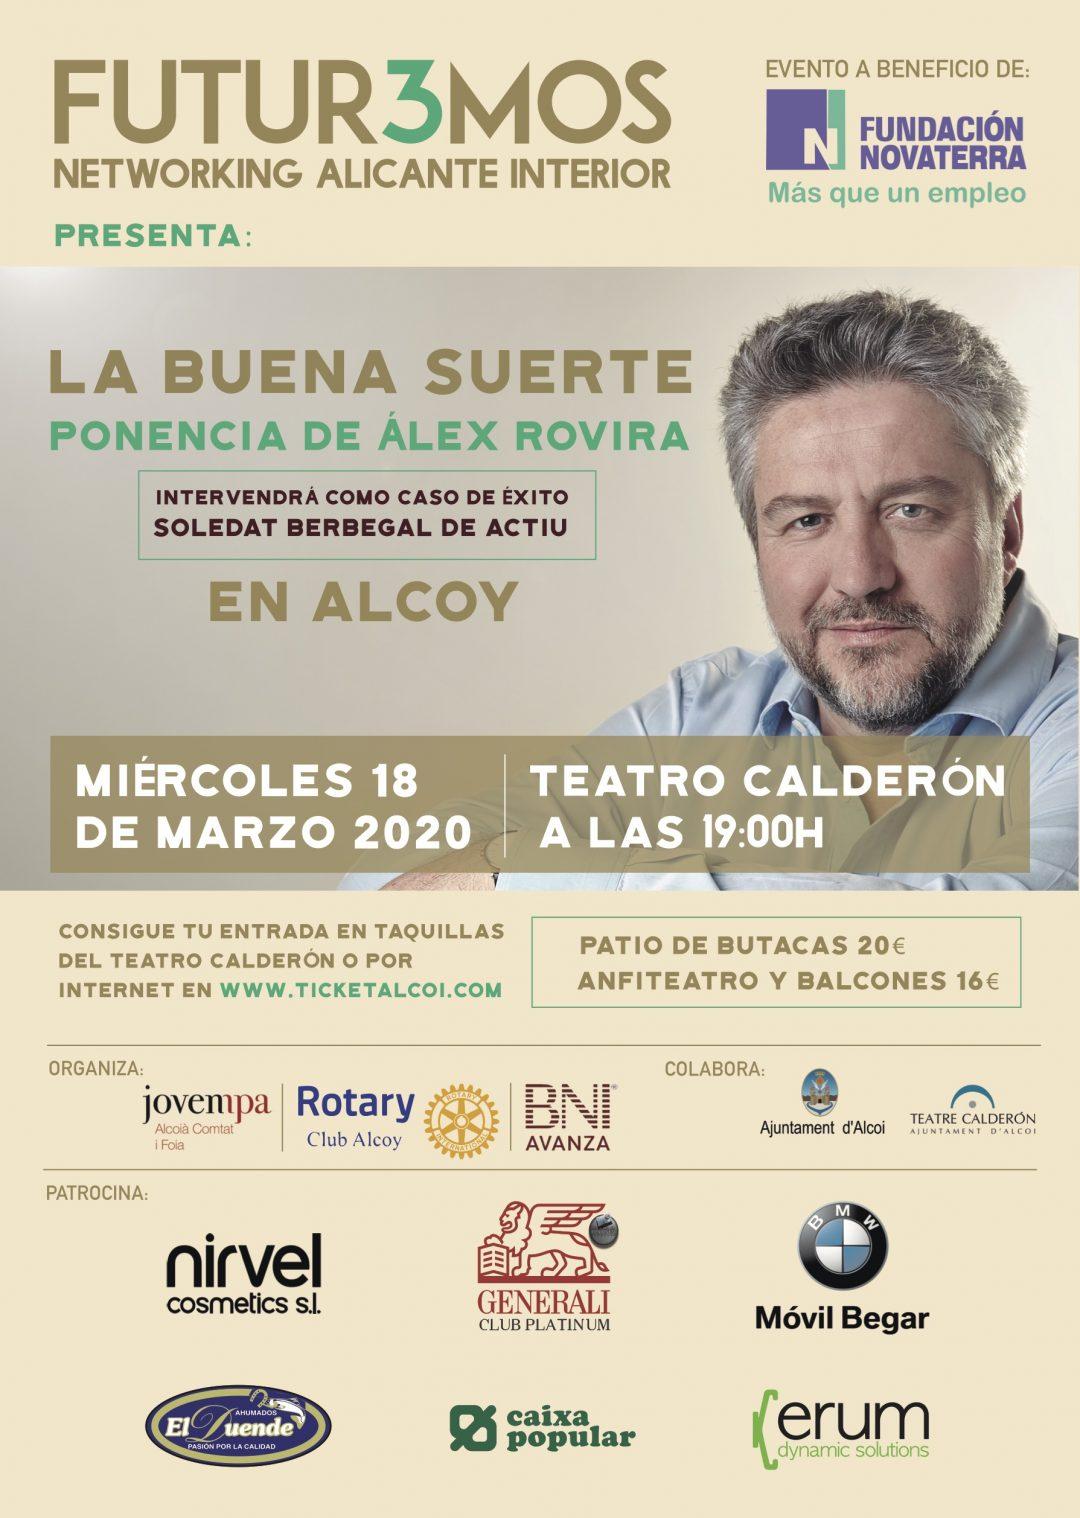 FUTUR3MOS – CONFERENCIA ÁLEX ROVIRA